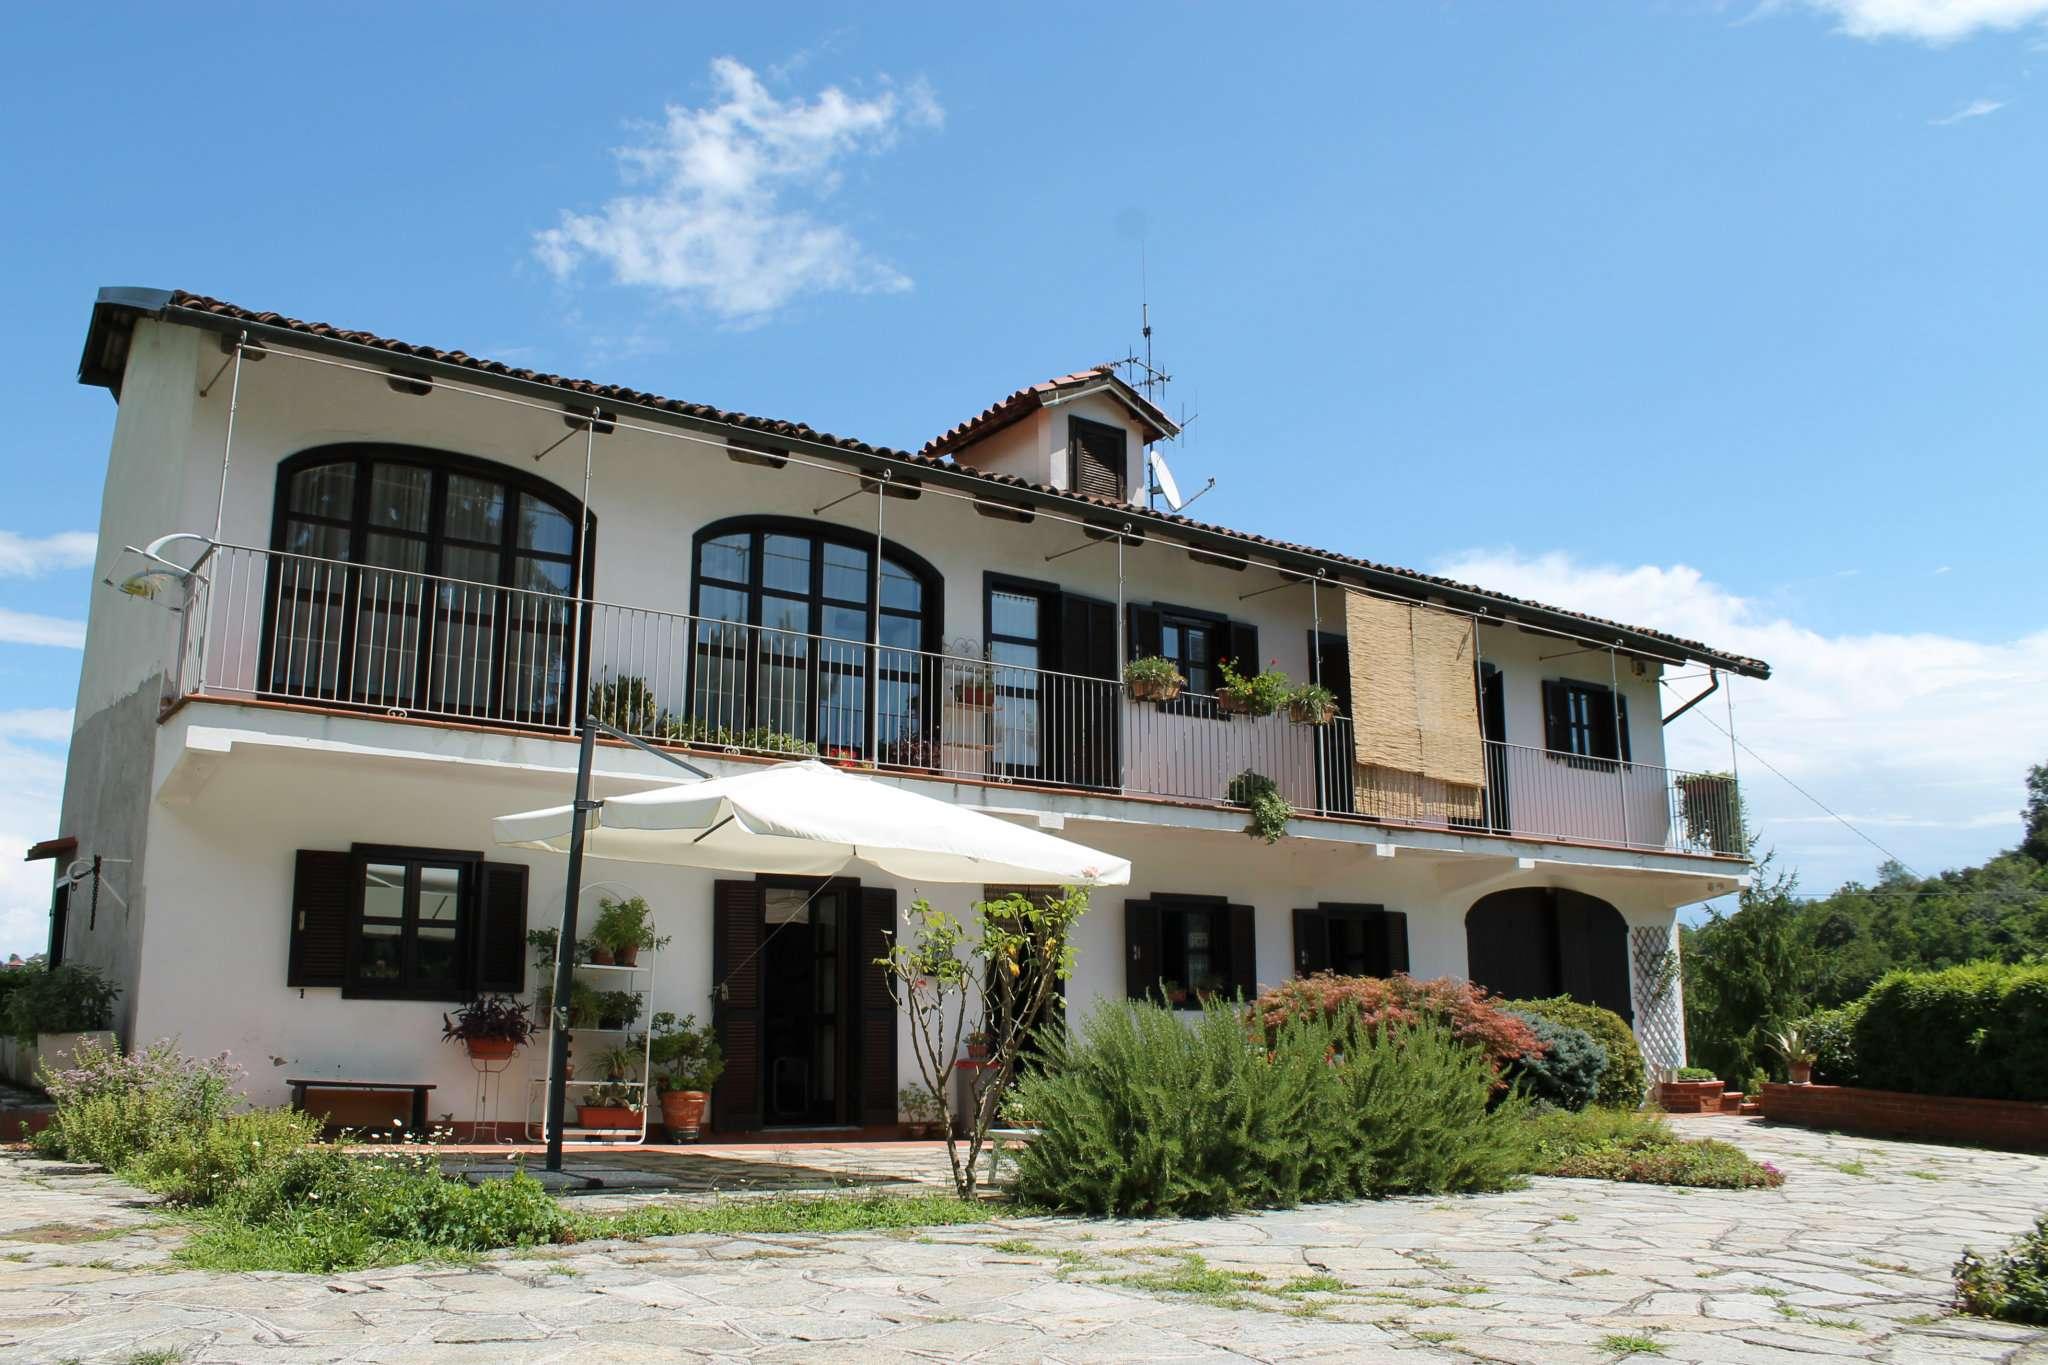 Rustico / Casale in Vendita a Gassino Torinese